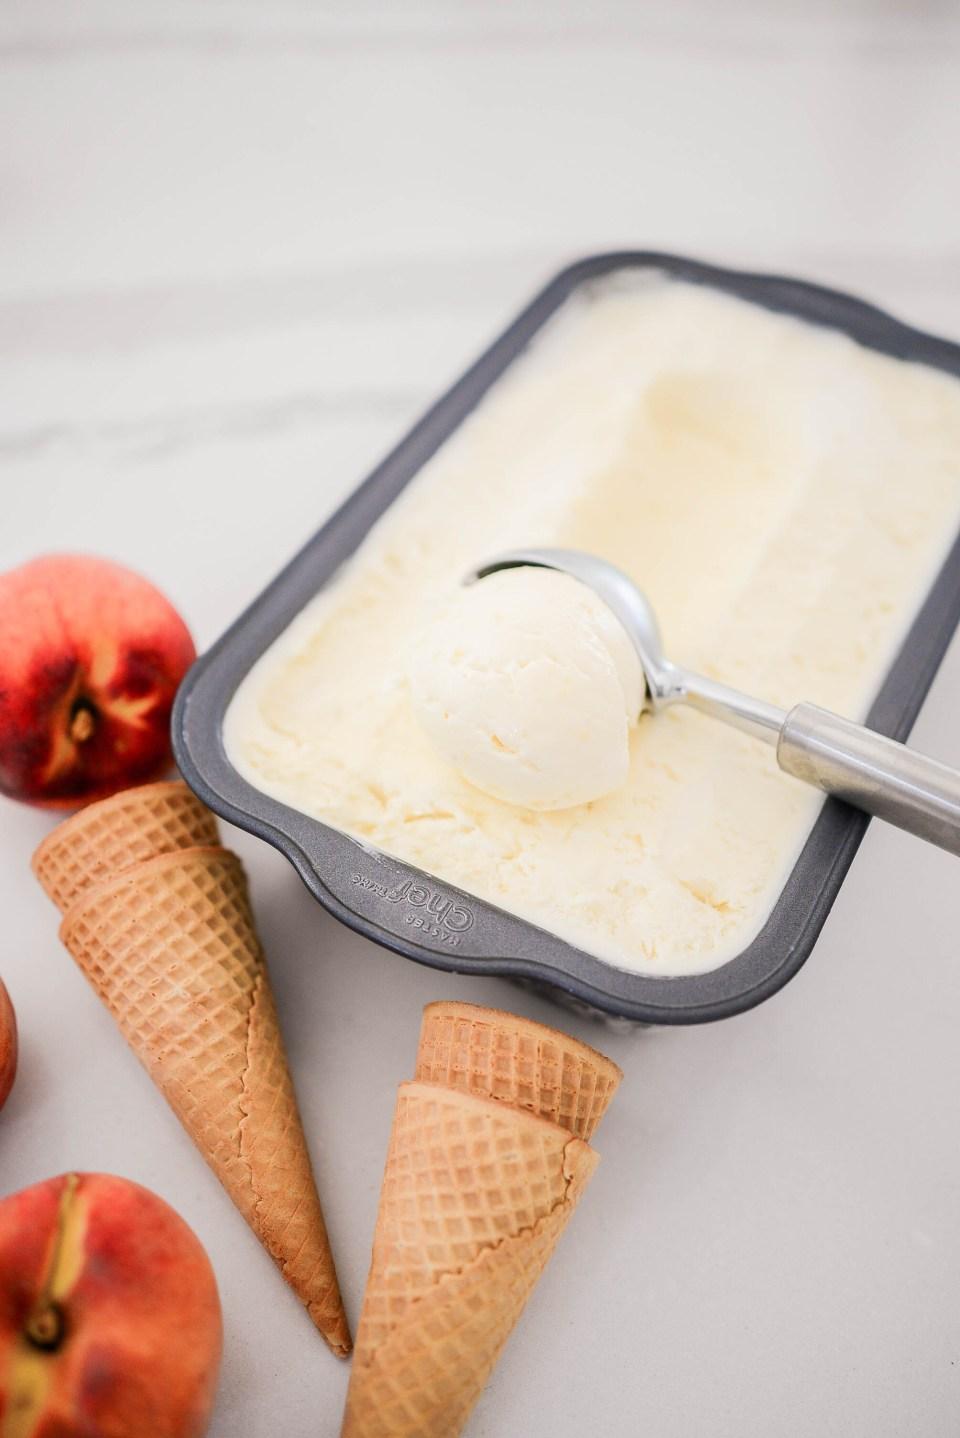 Easy Homemade Ice Cream - No Churn Ice Cream Recipe